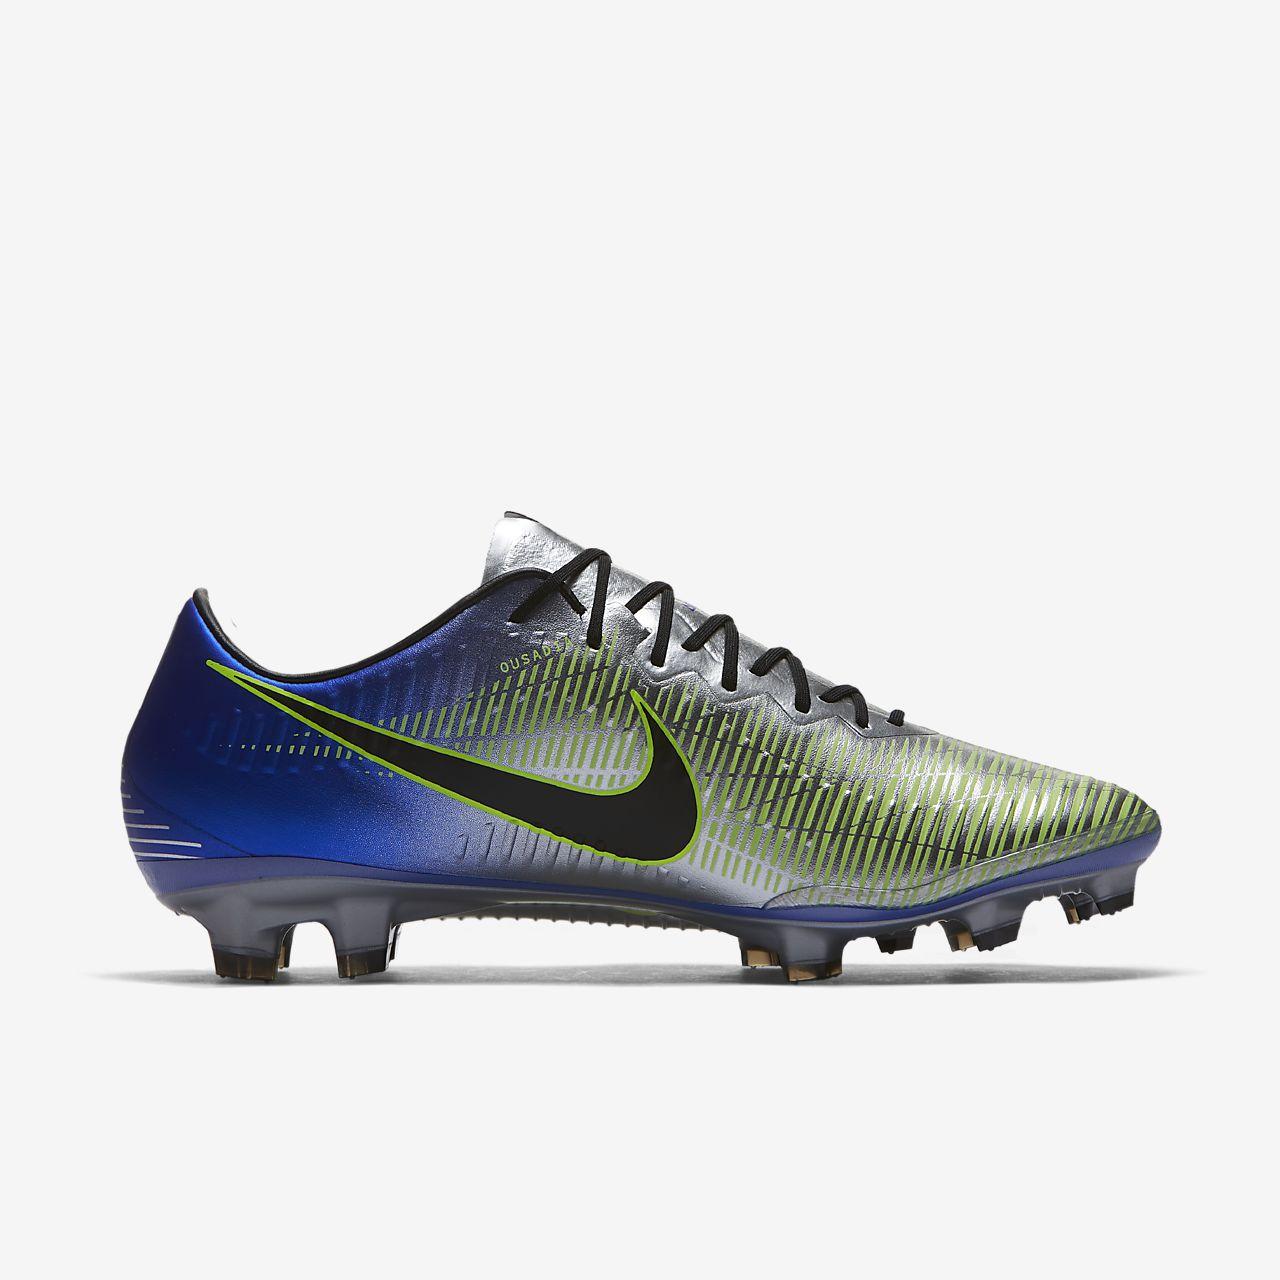 botas de futbol nike neymar